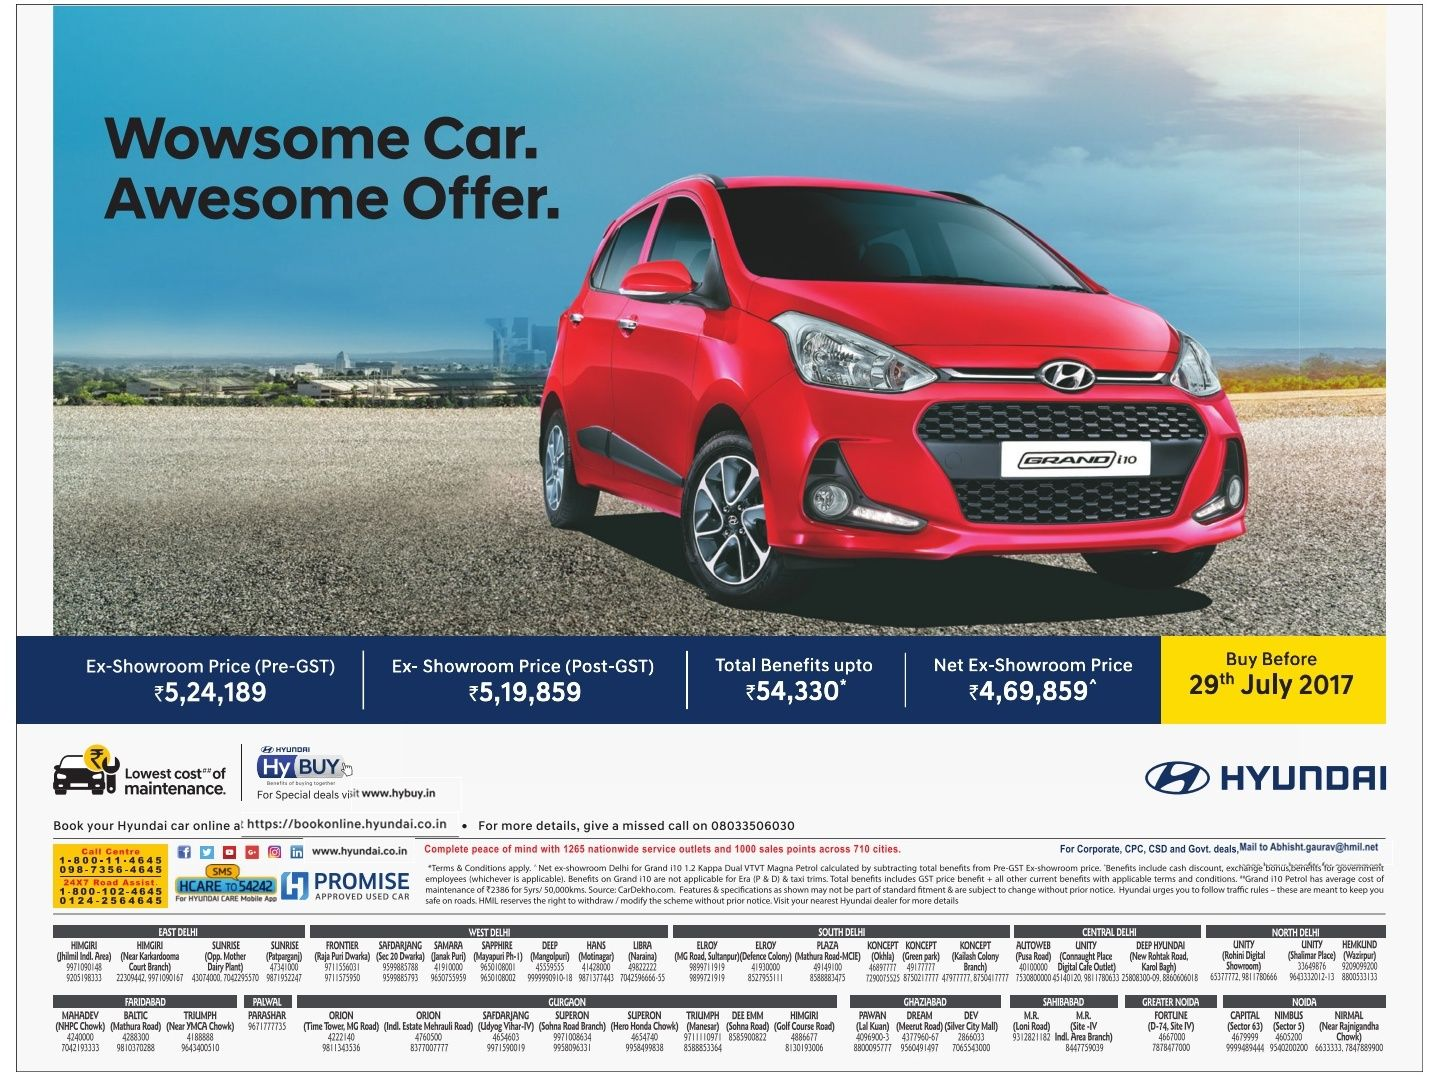 Hyundai Grand I10 Car Wowsome Car Ad Car Ads Car Advertising